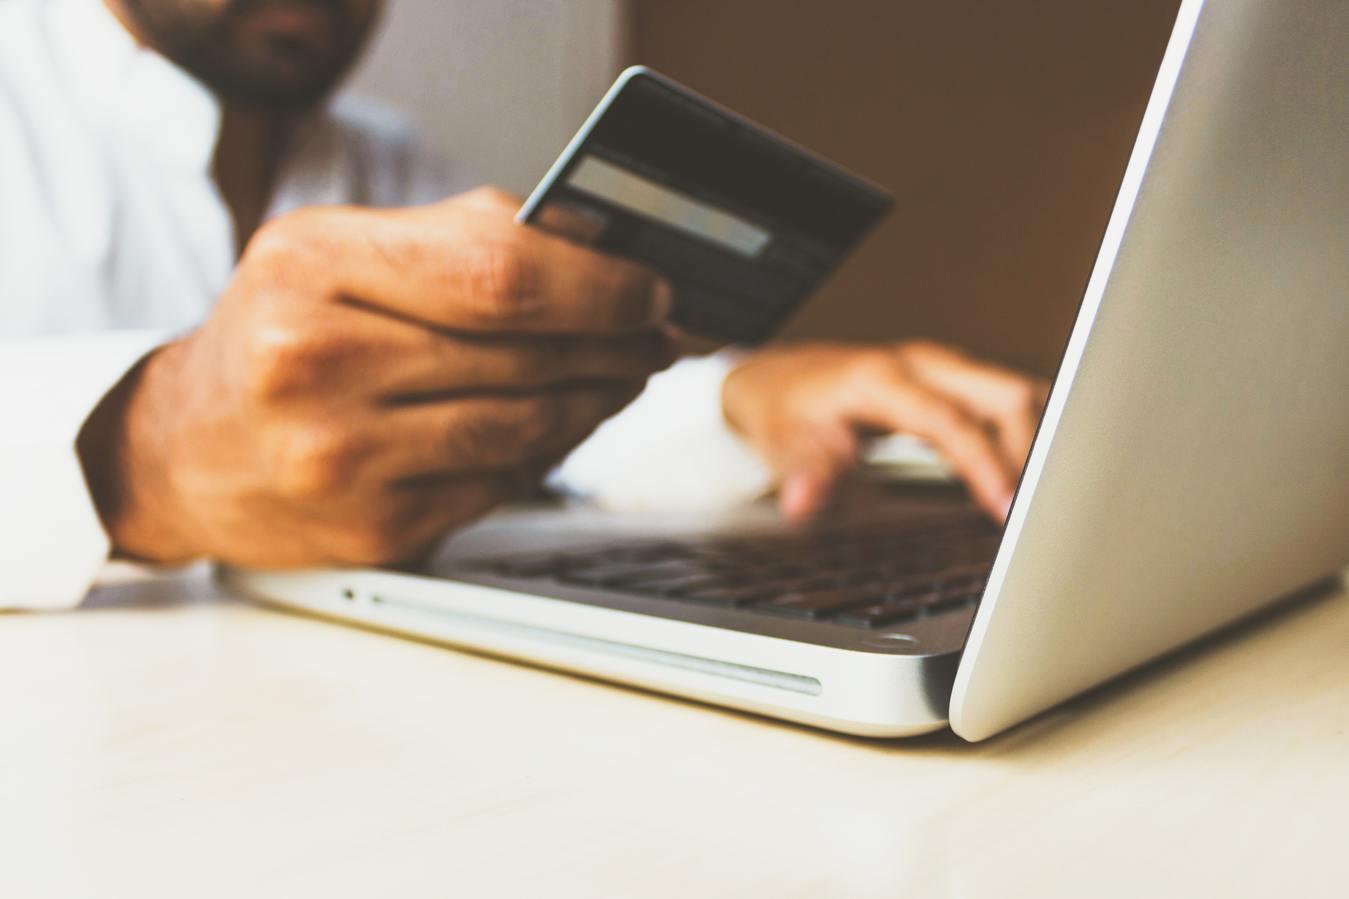 Internetowa transakcja kartą